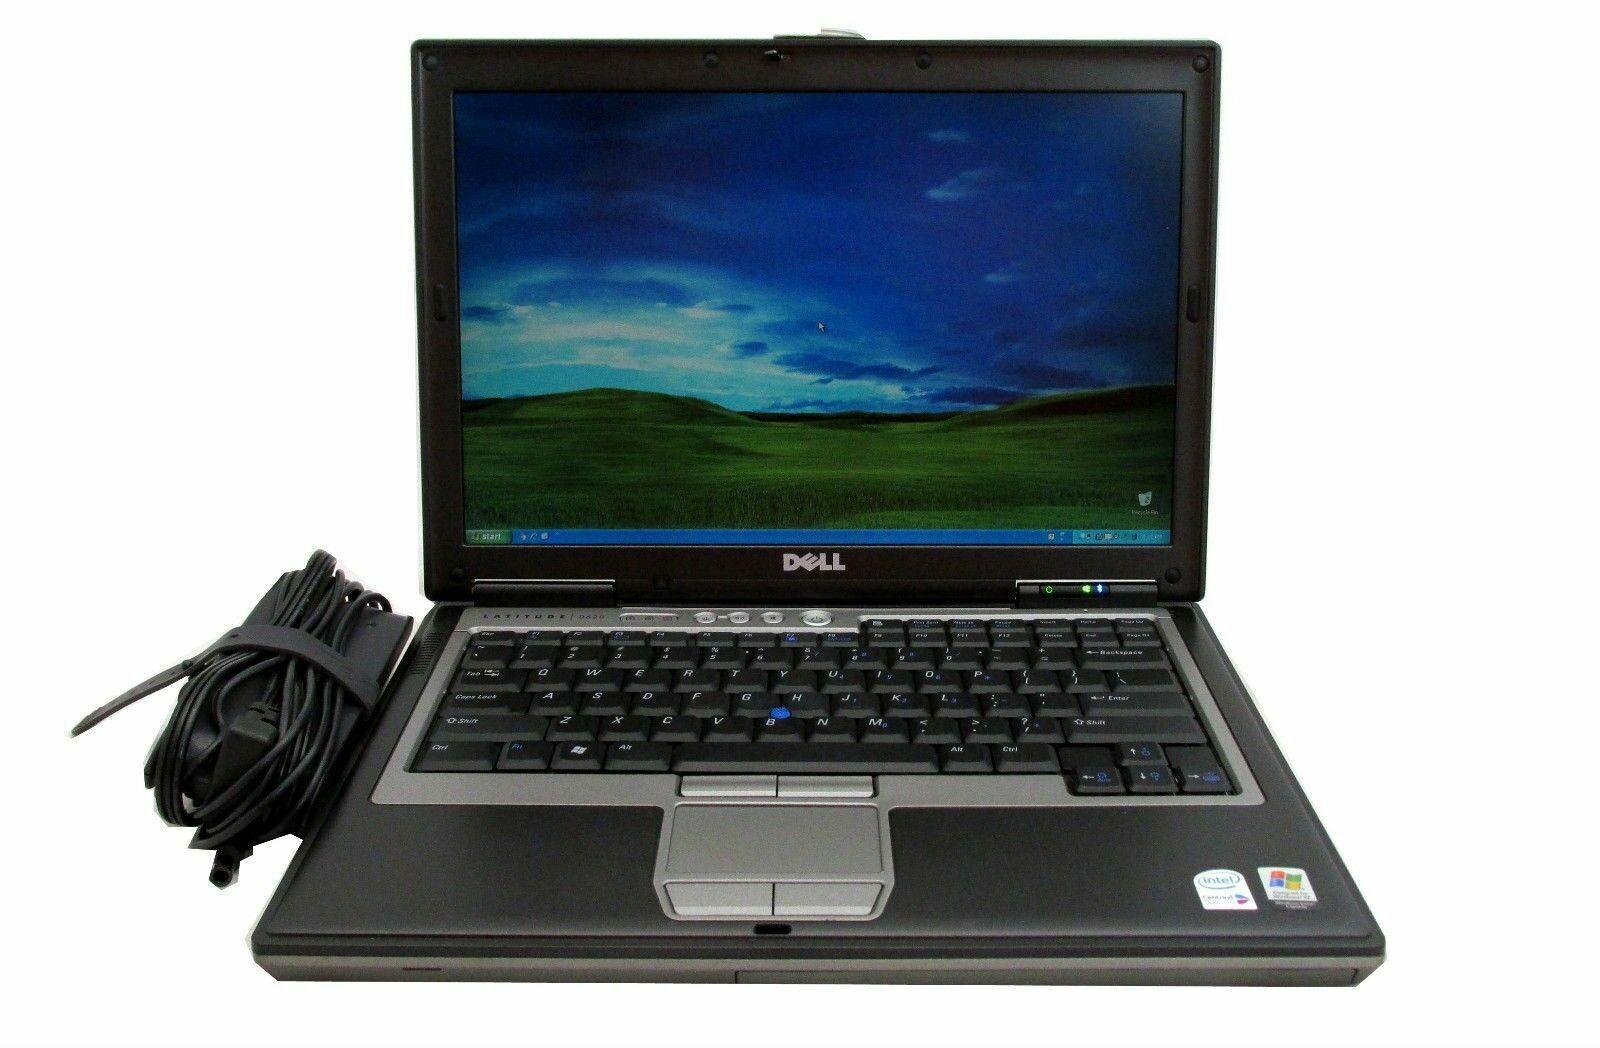 Laptop Windows - Dell Latitude Laptop Computer Core 2 Duo 4GB WiFi DVD Windows 7 Notebook 80gb HD